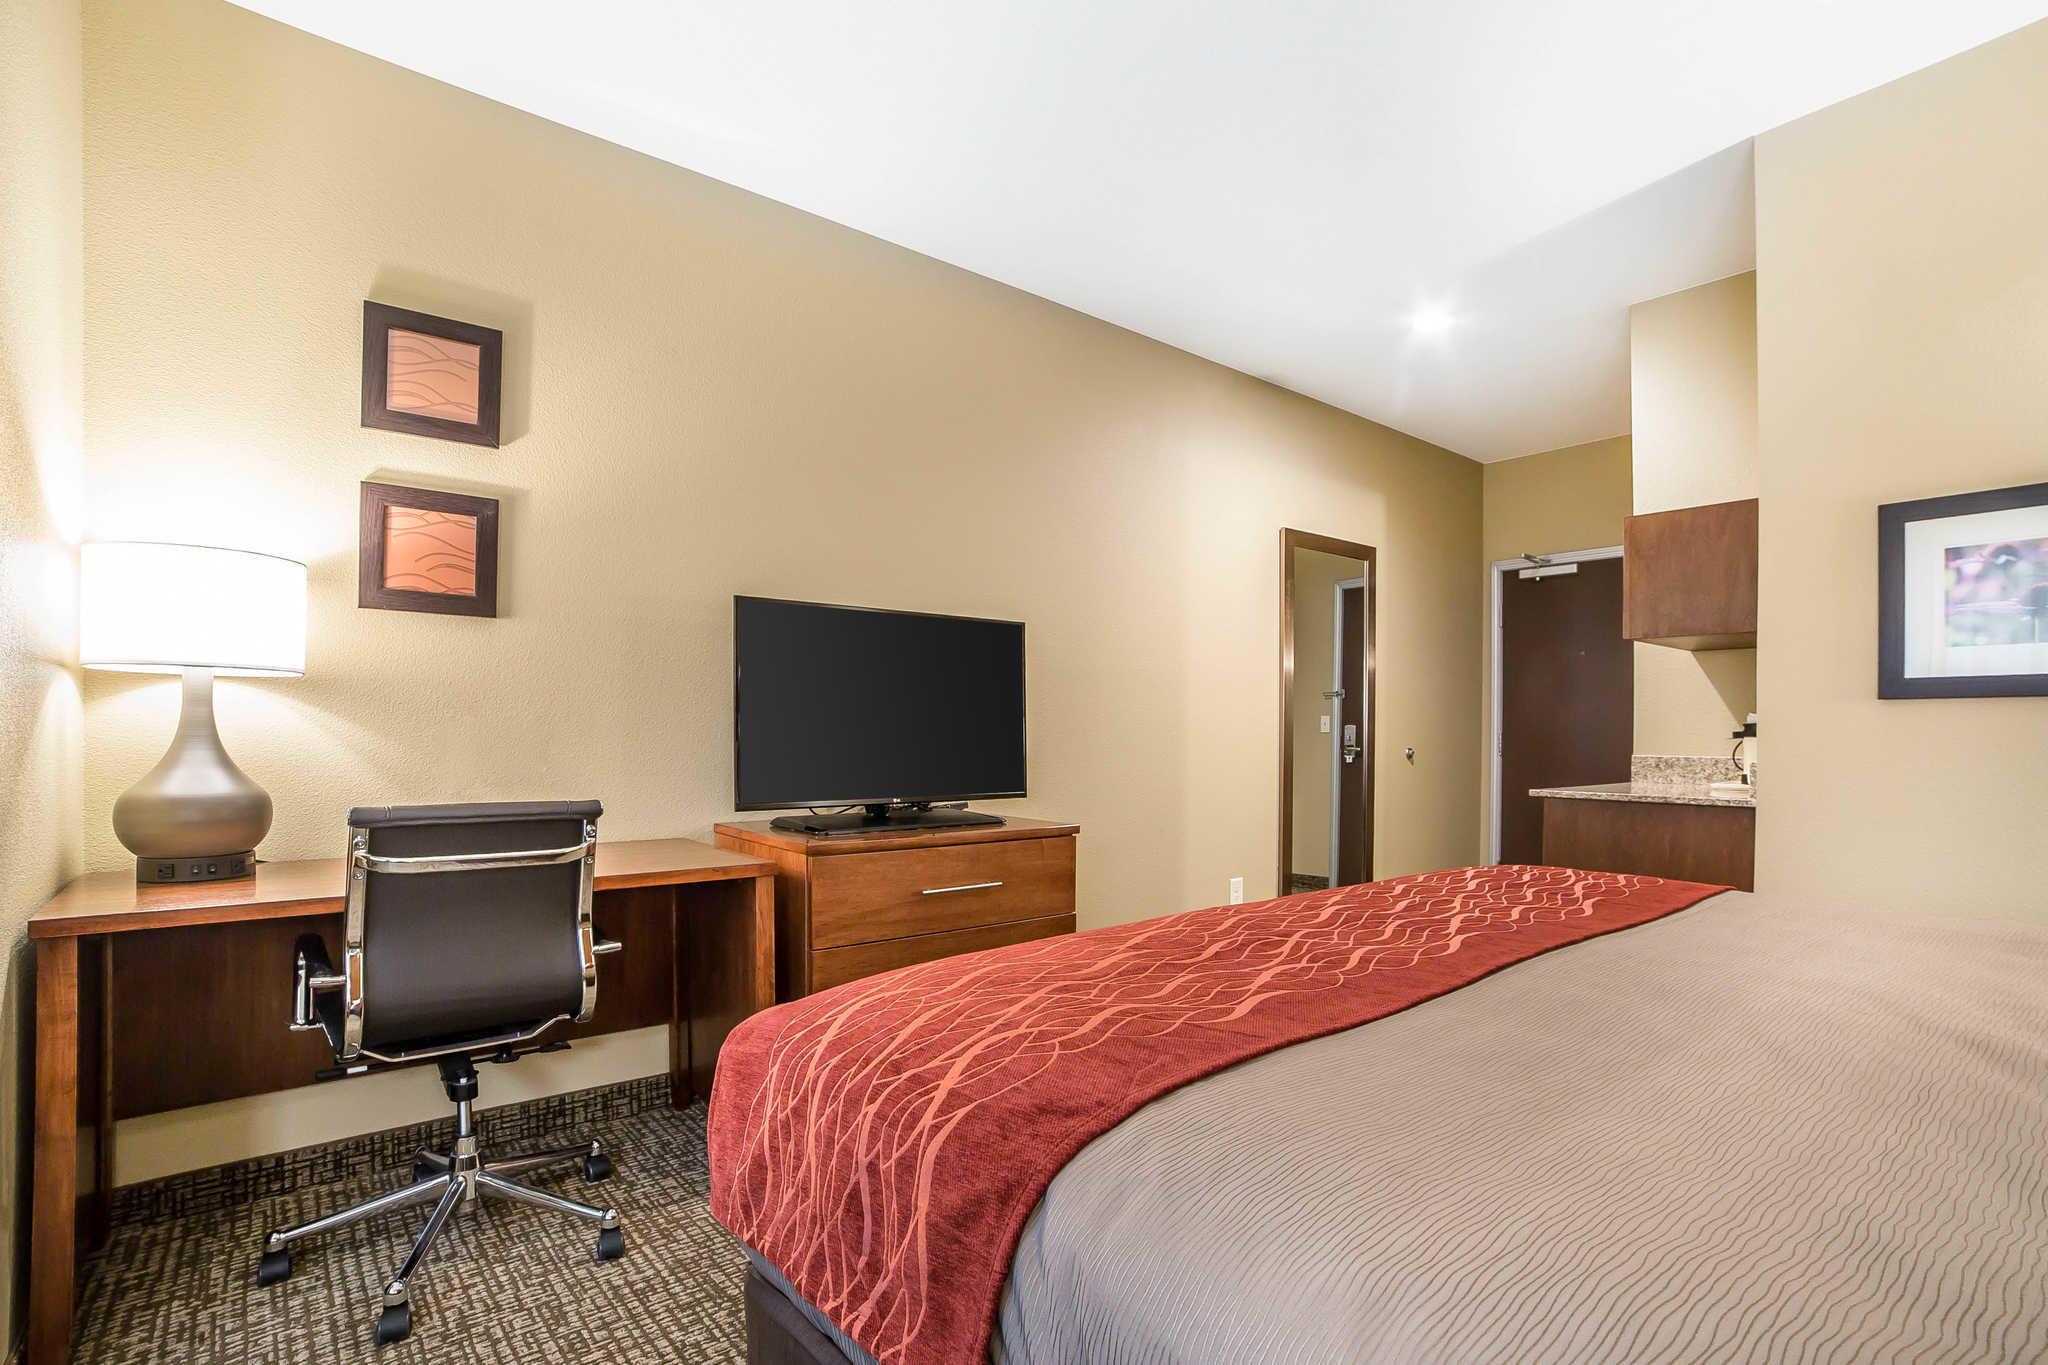 Comfort Inn & Suites Near Mt. Rushmore image 8